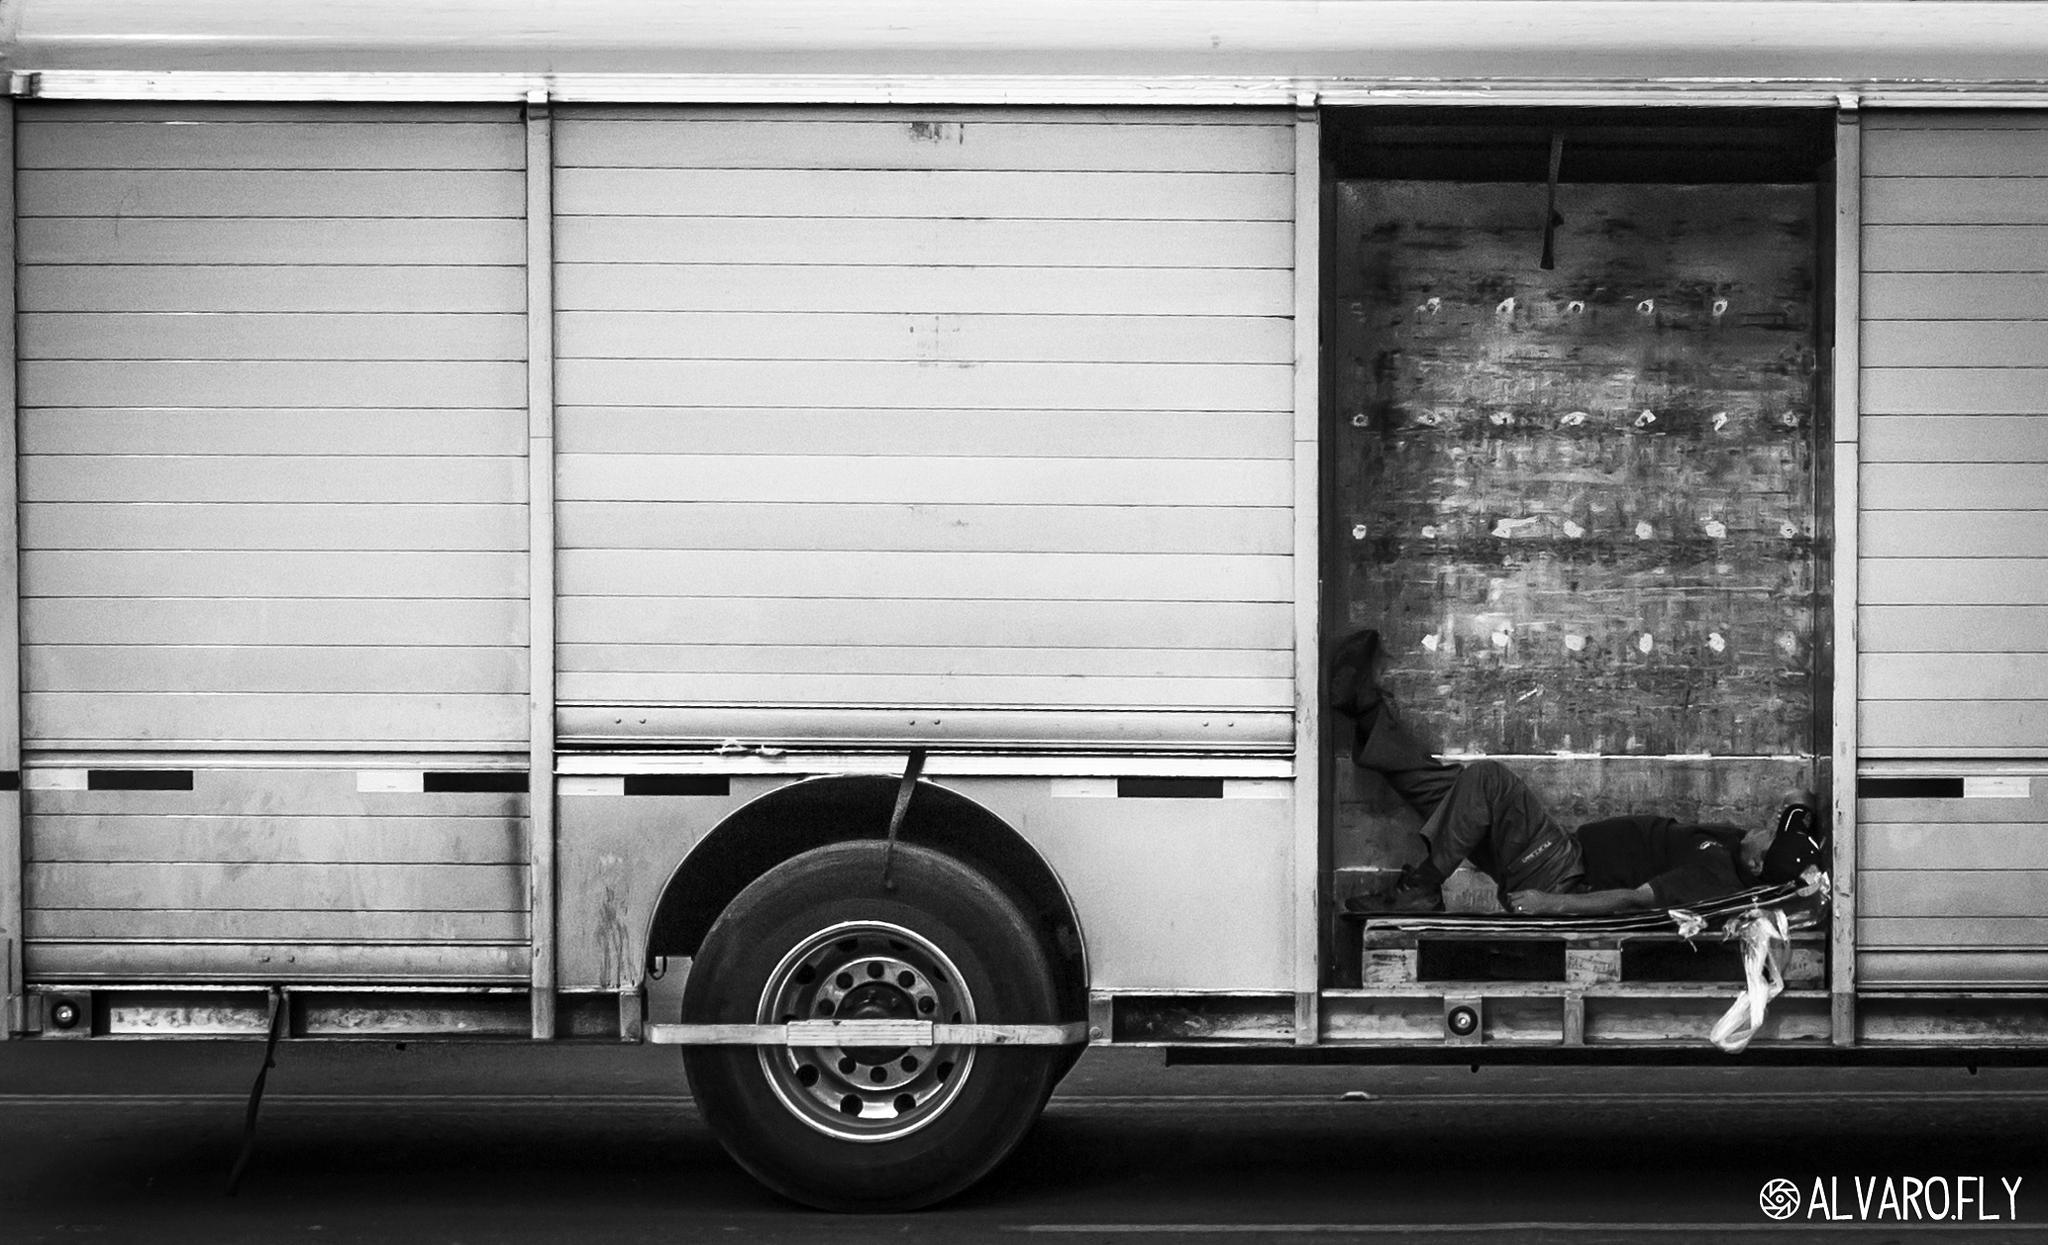 TRANSPORT by FLYFOTO